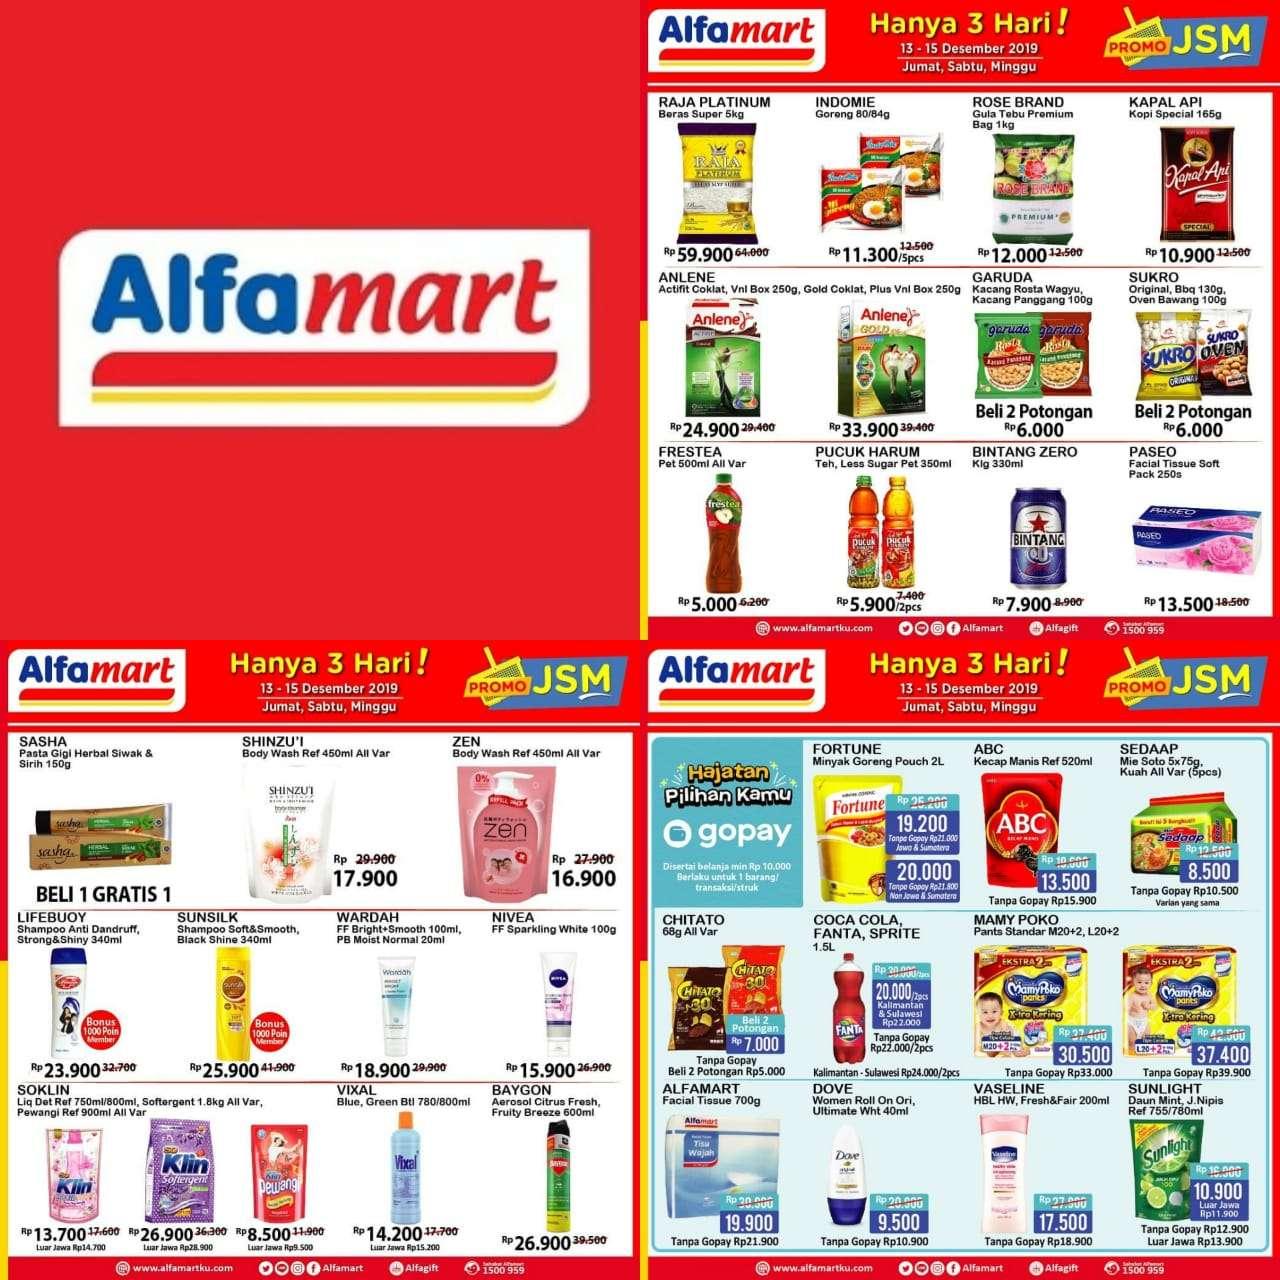 Katalog Promo JSM Alfamart Periode 13-15 Desember 2019